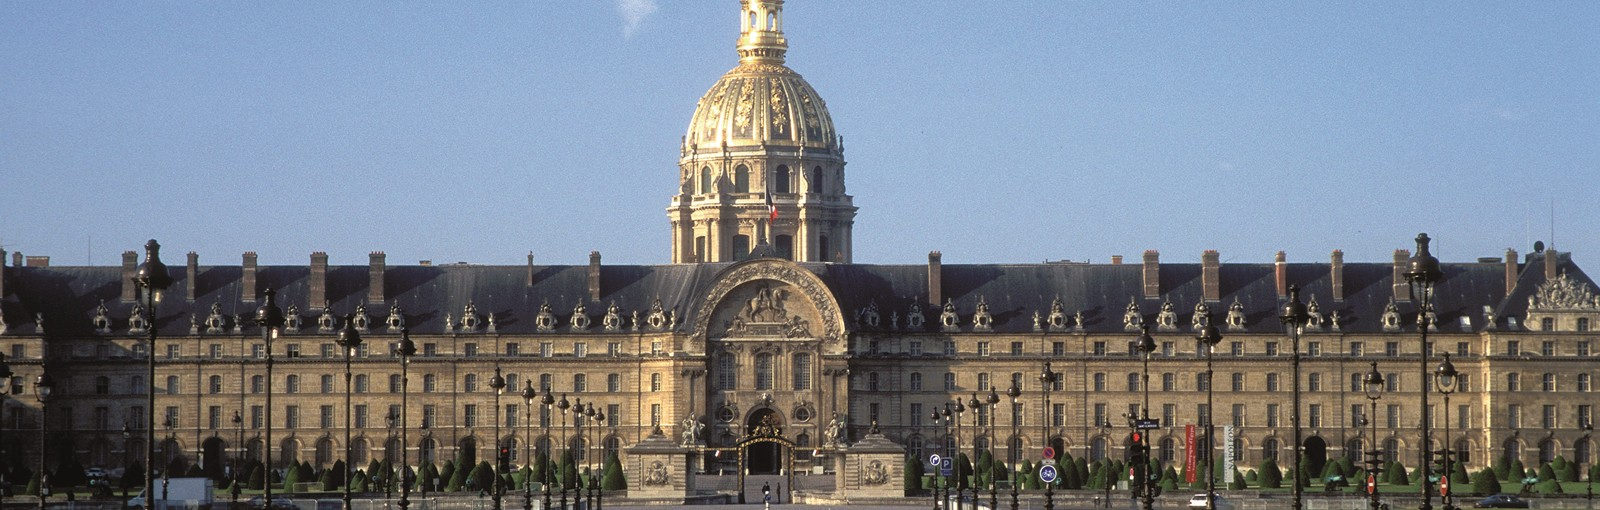 Tours 荣军院,巴黎军事博物馆,拿破仑墓 - 徒步游 - 巴黎游